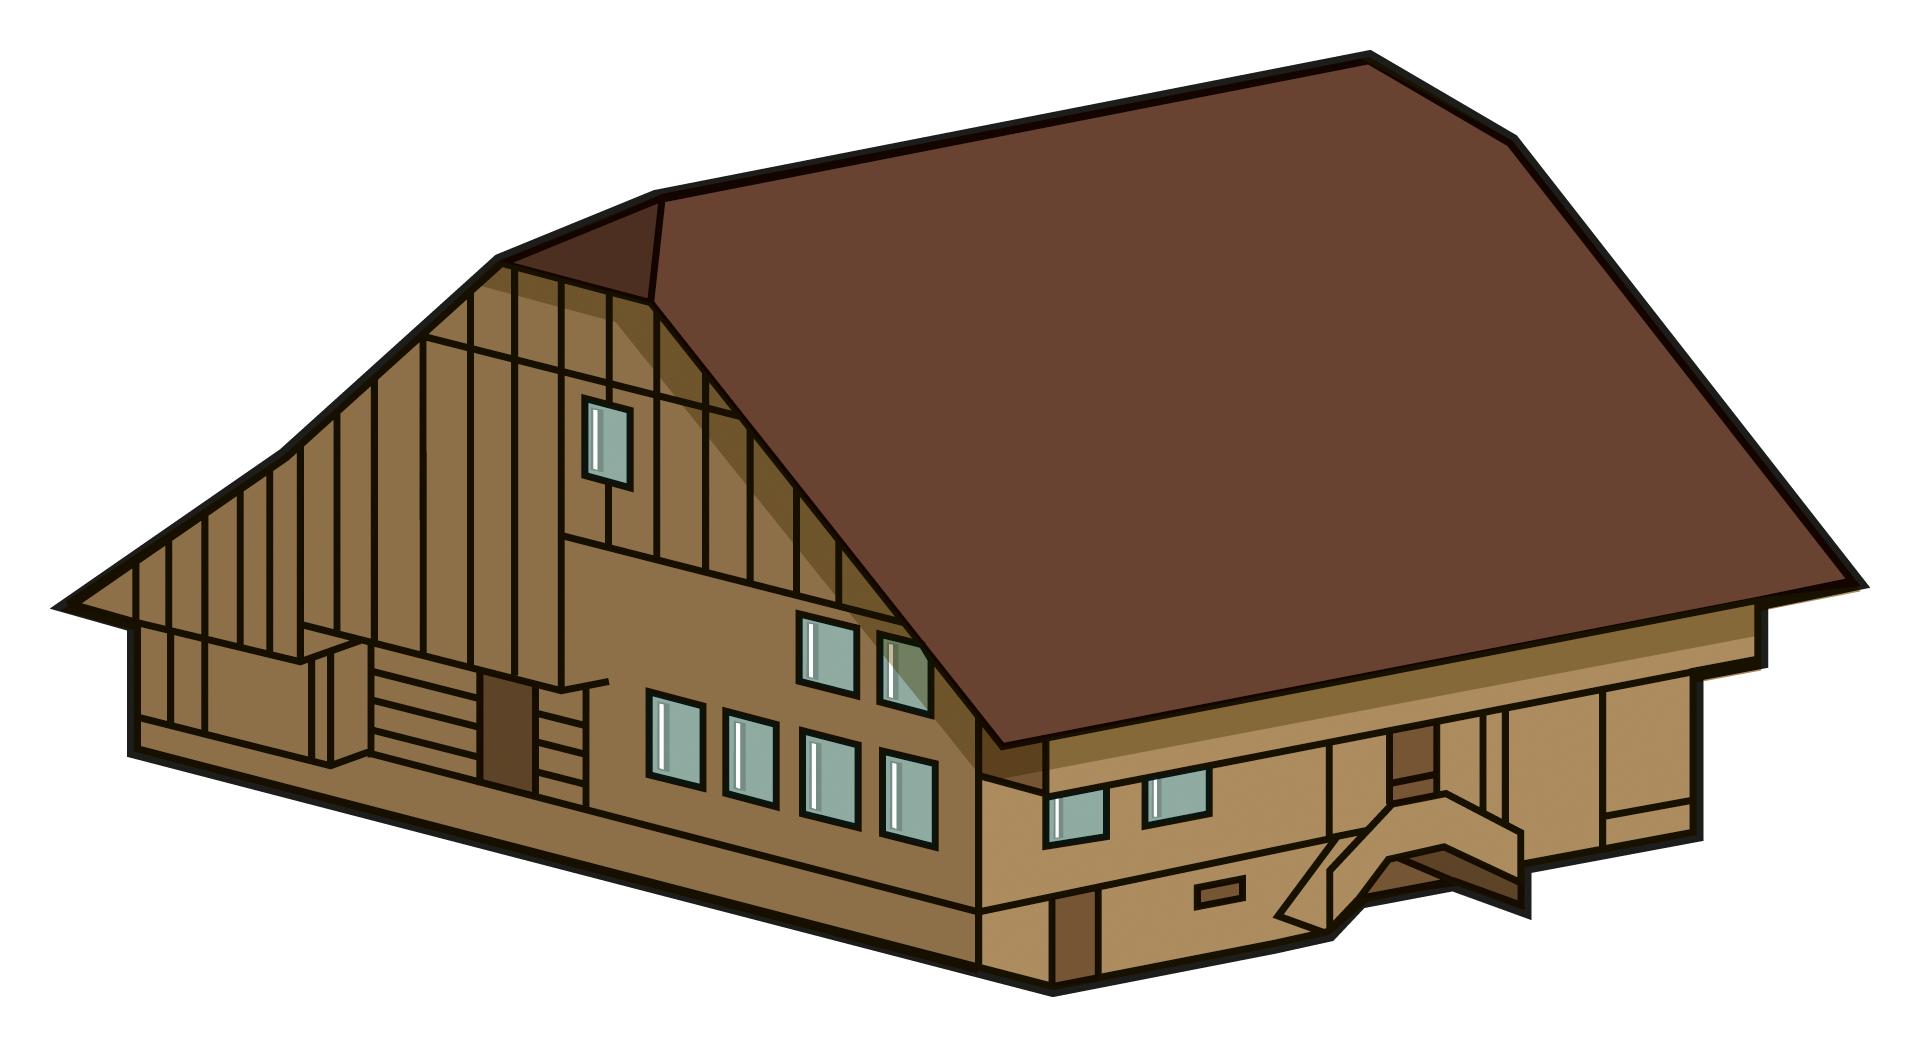 . Farmhouse clipart rural area